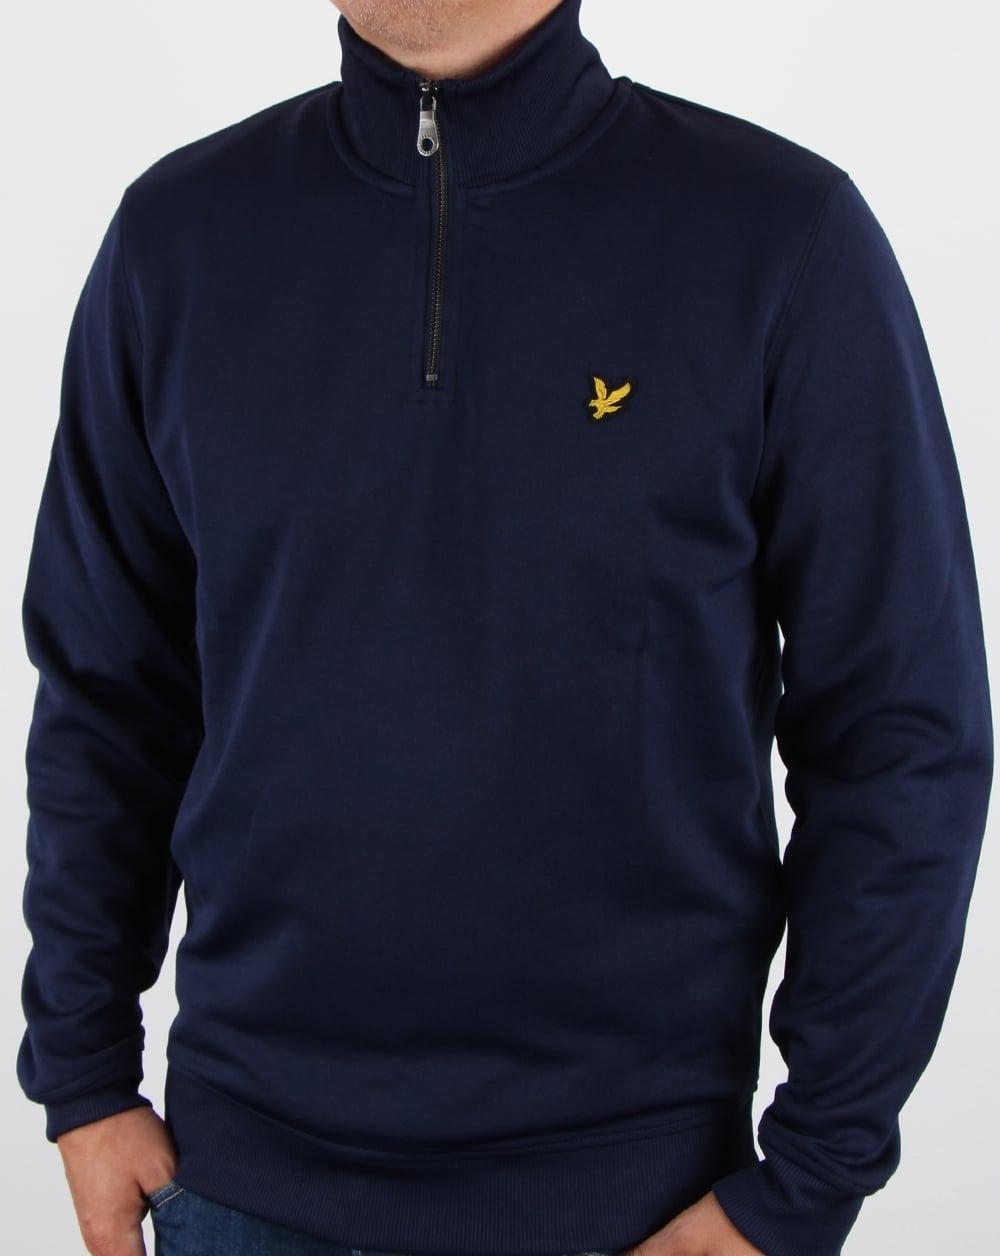 lyle and scott tricot 1 4 zip navy top track jacket mens. Black Bedroom Furniture Sets. Home Design Ideas